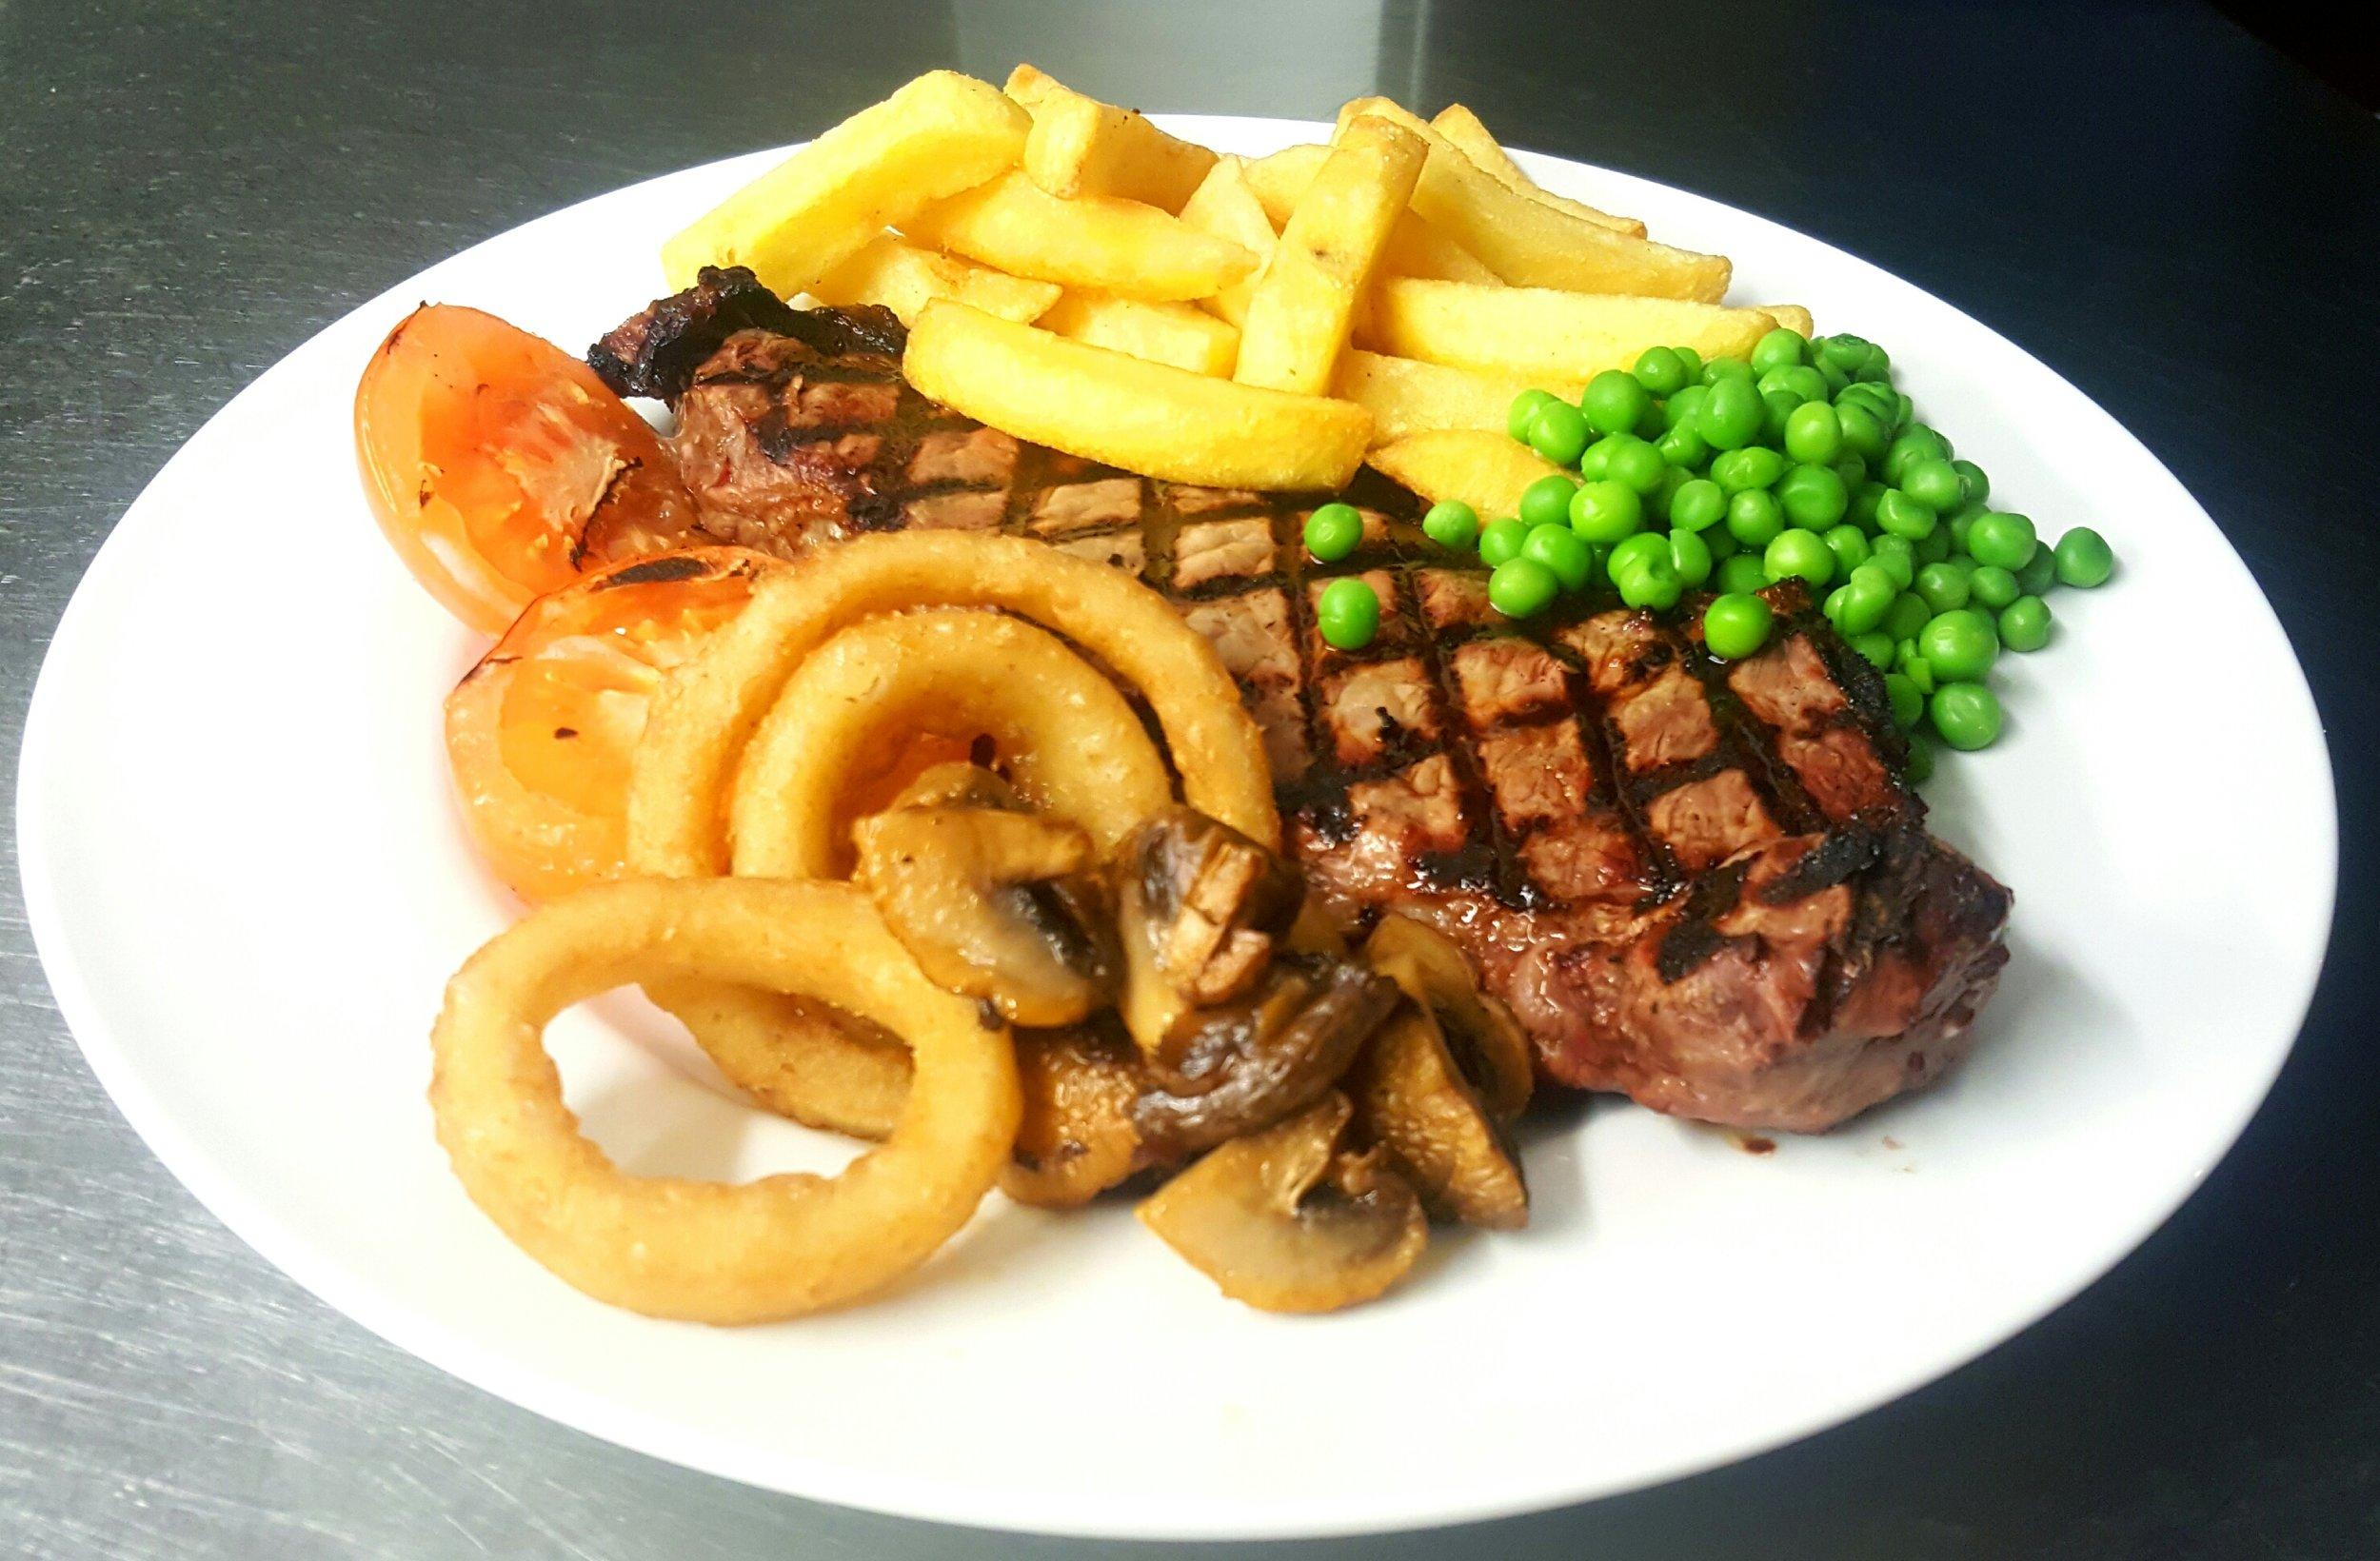 Regular sirloin steak